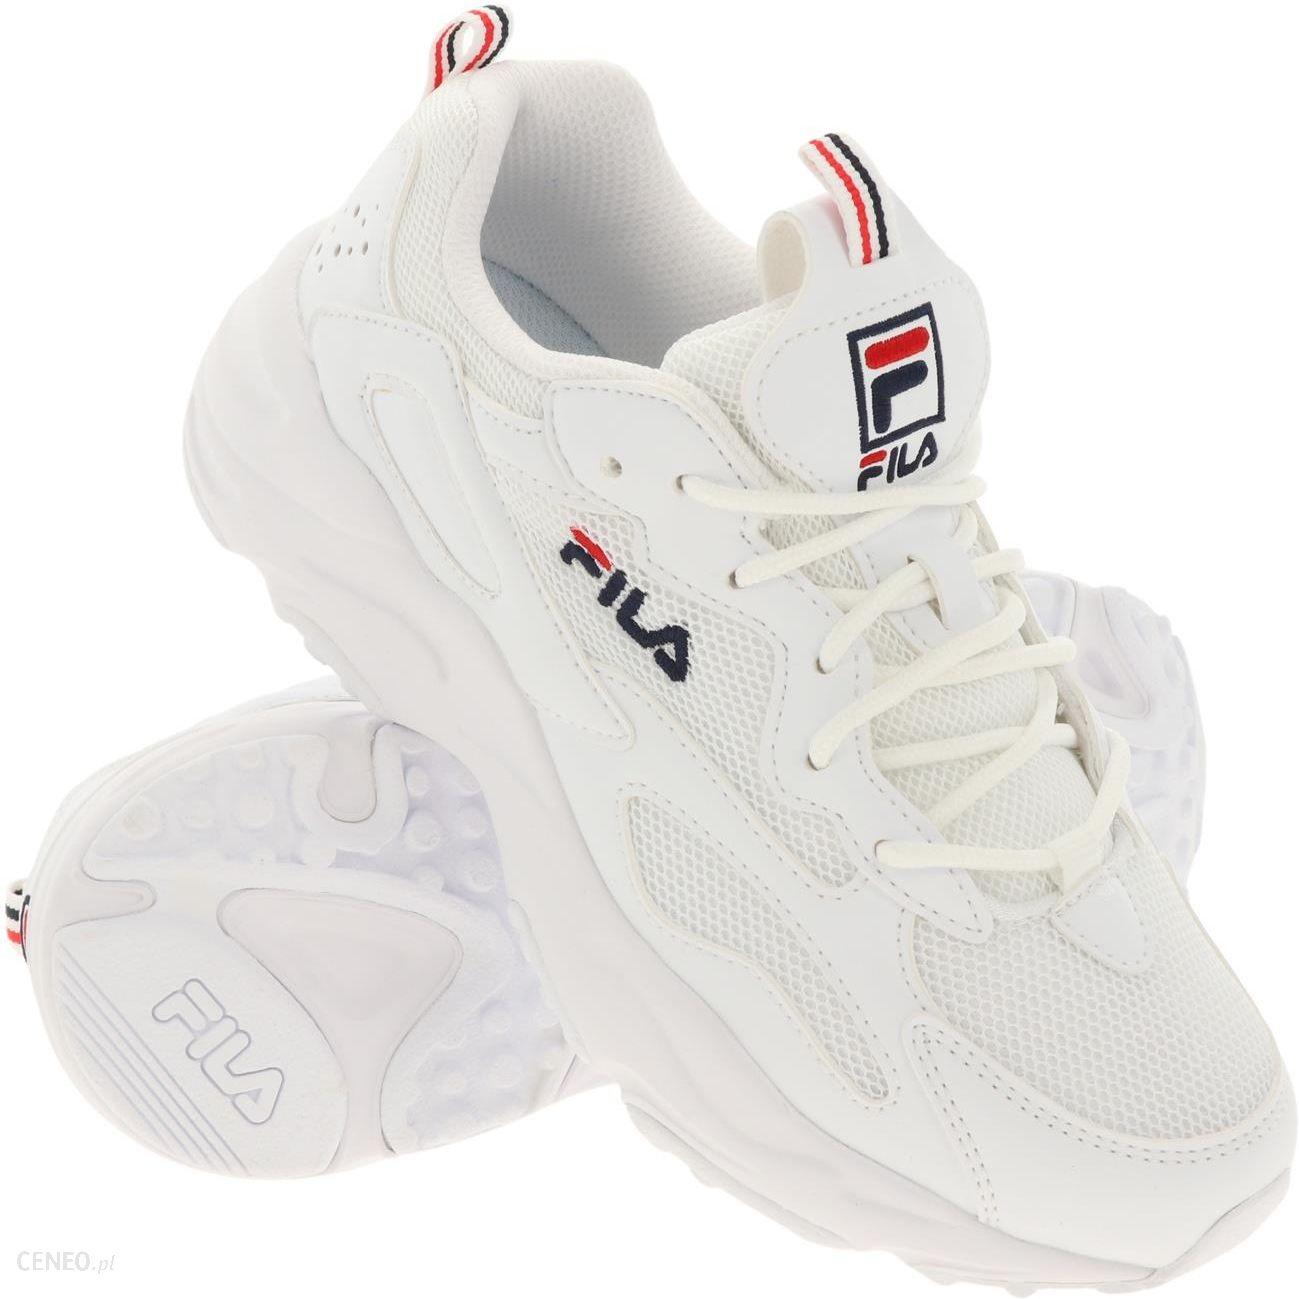 Damskie buty RAY TRACER 1010884 1FG FILA